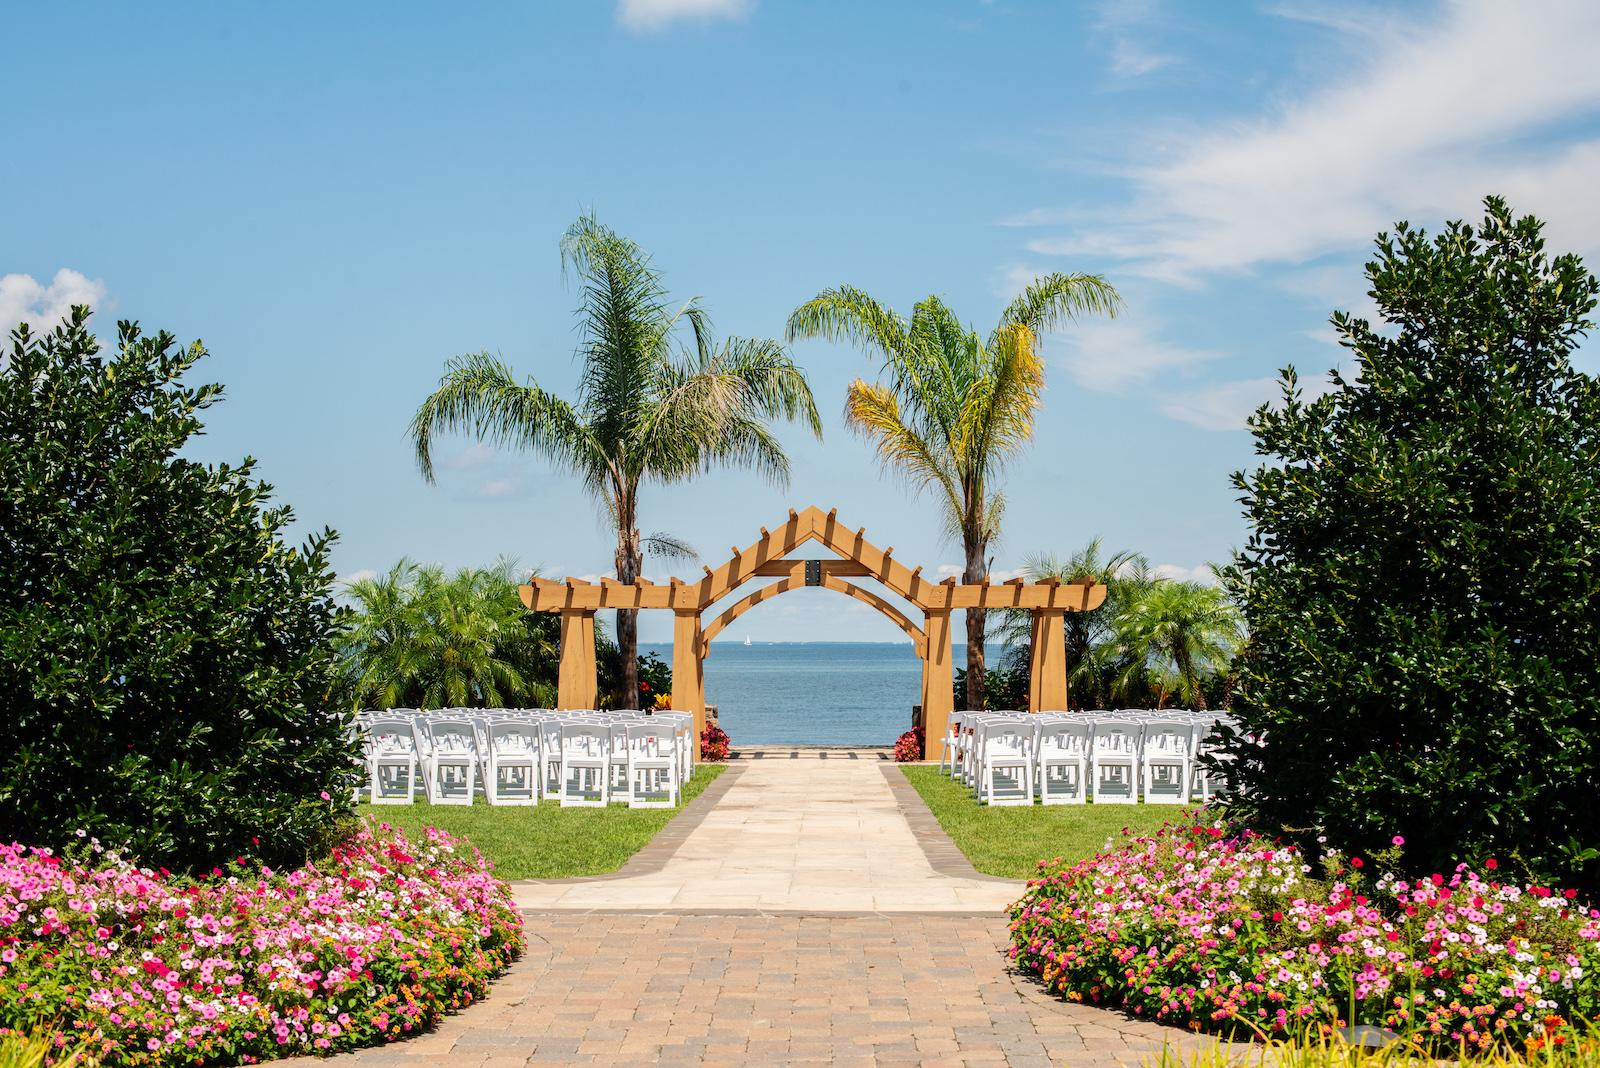 Herring Bay Garden Archway